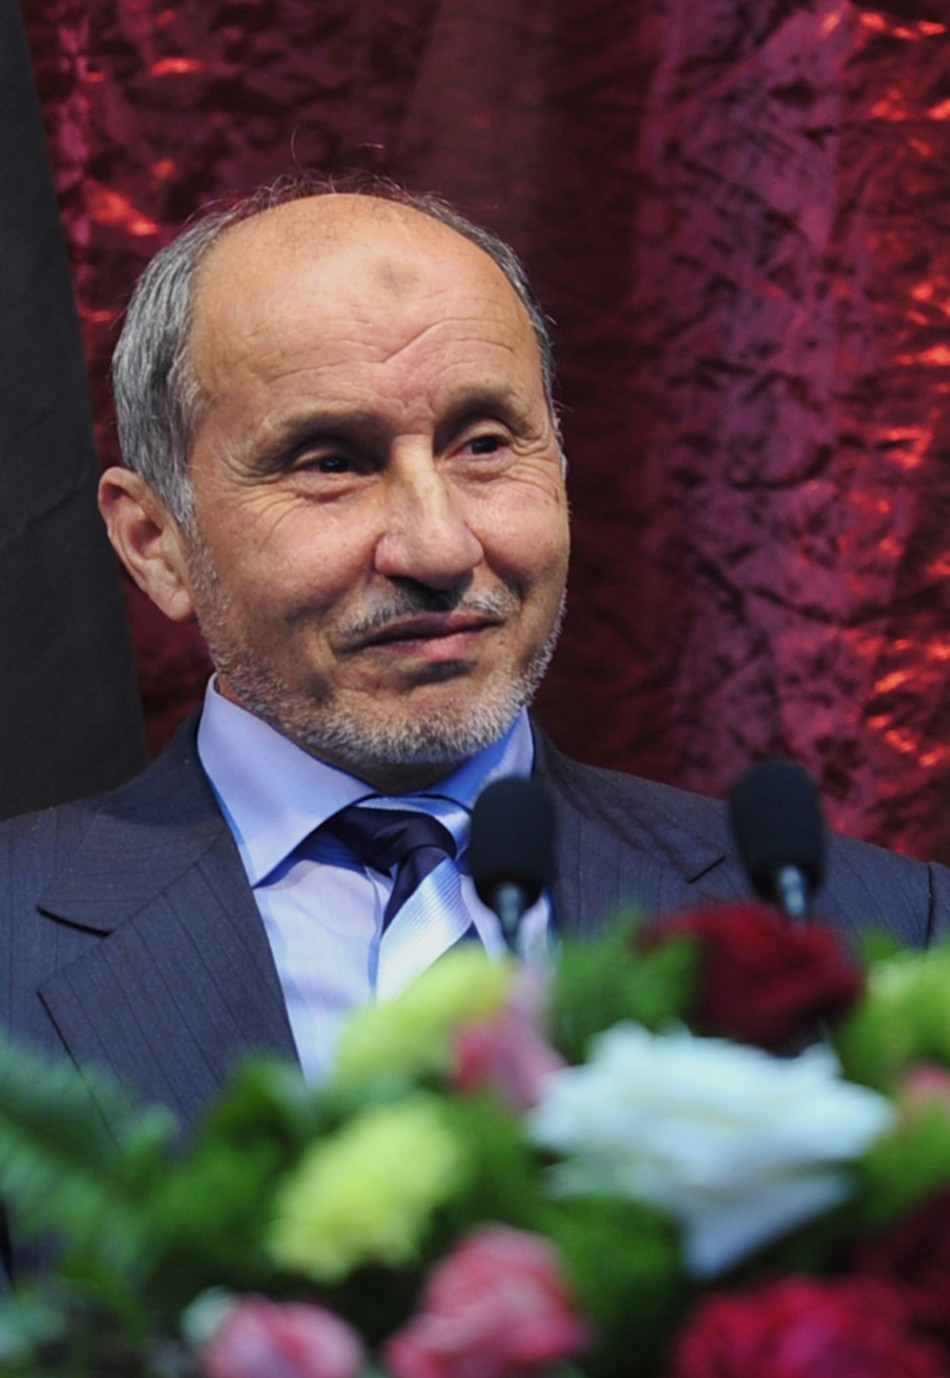 Libya's NTC leader Abdel Jalil listens meets  civil society institutions in Benghazi